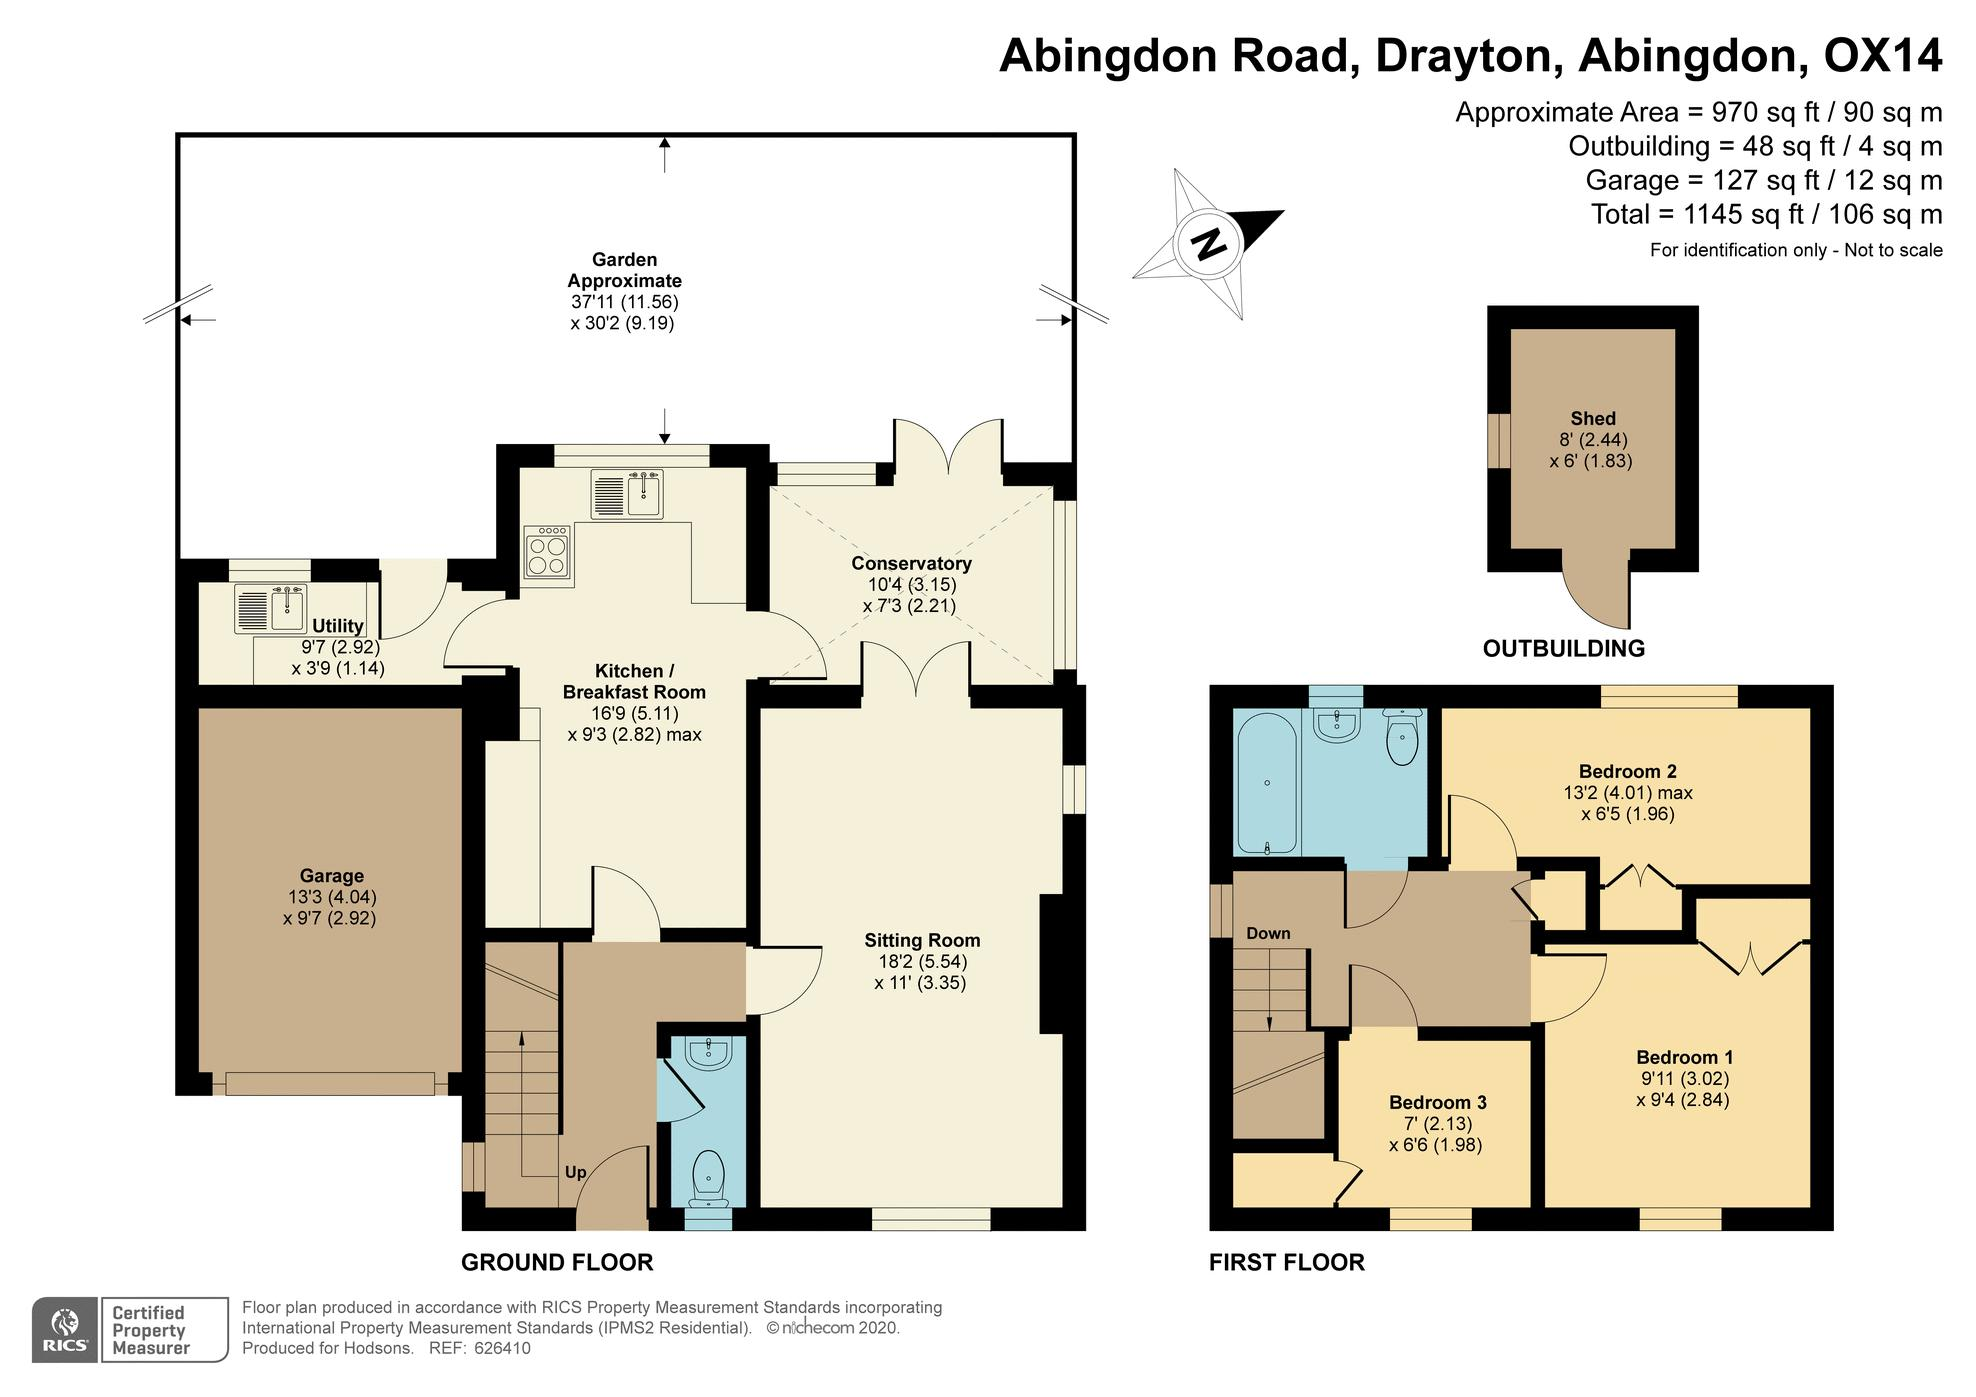 Abingdon Road Drayton